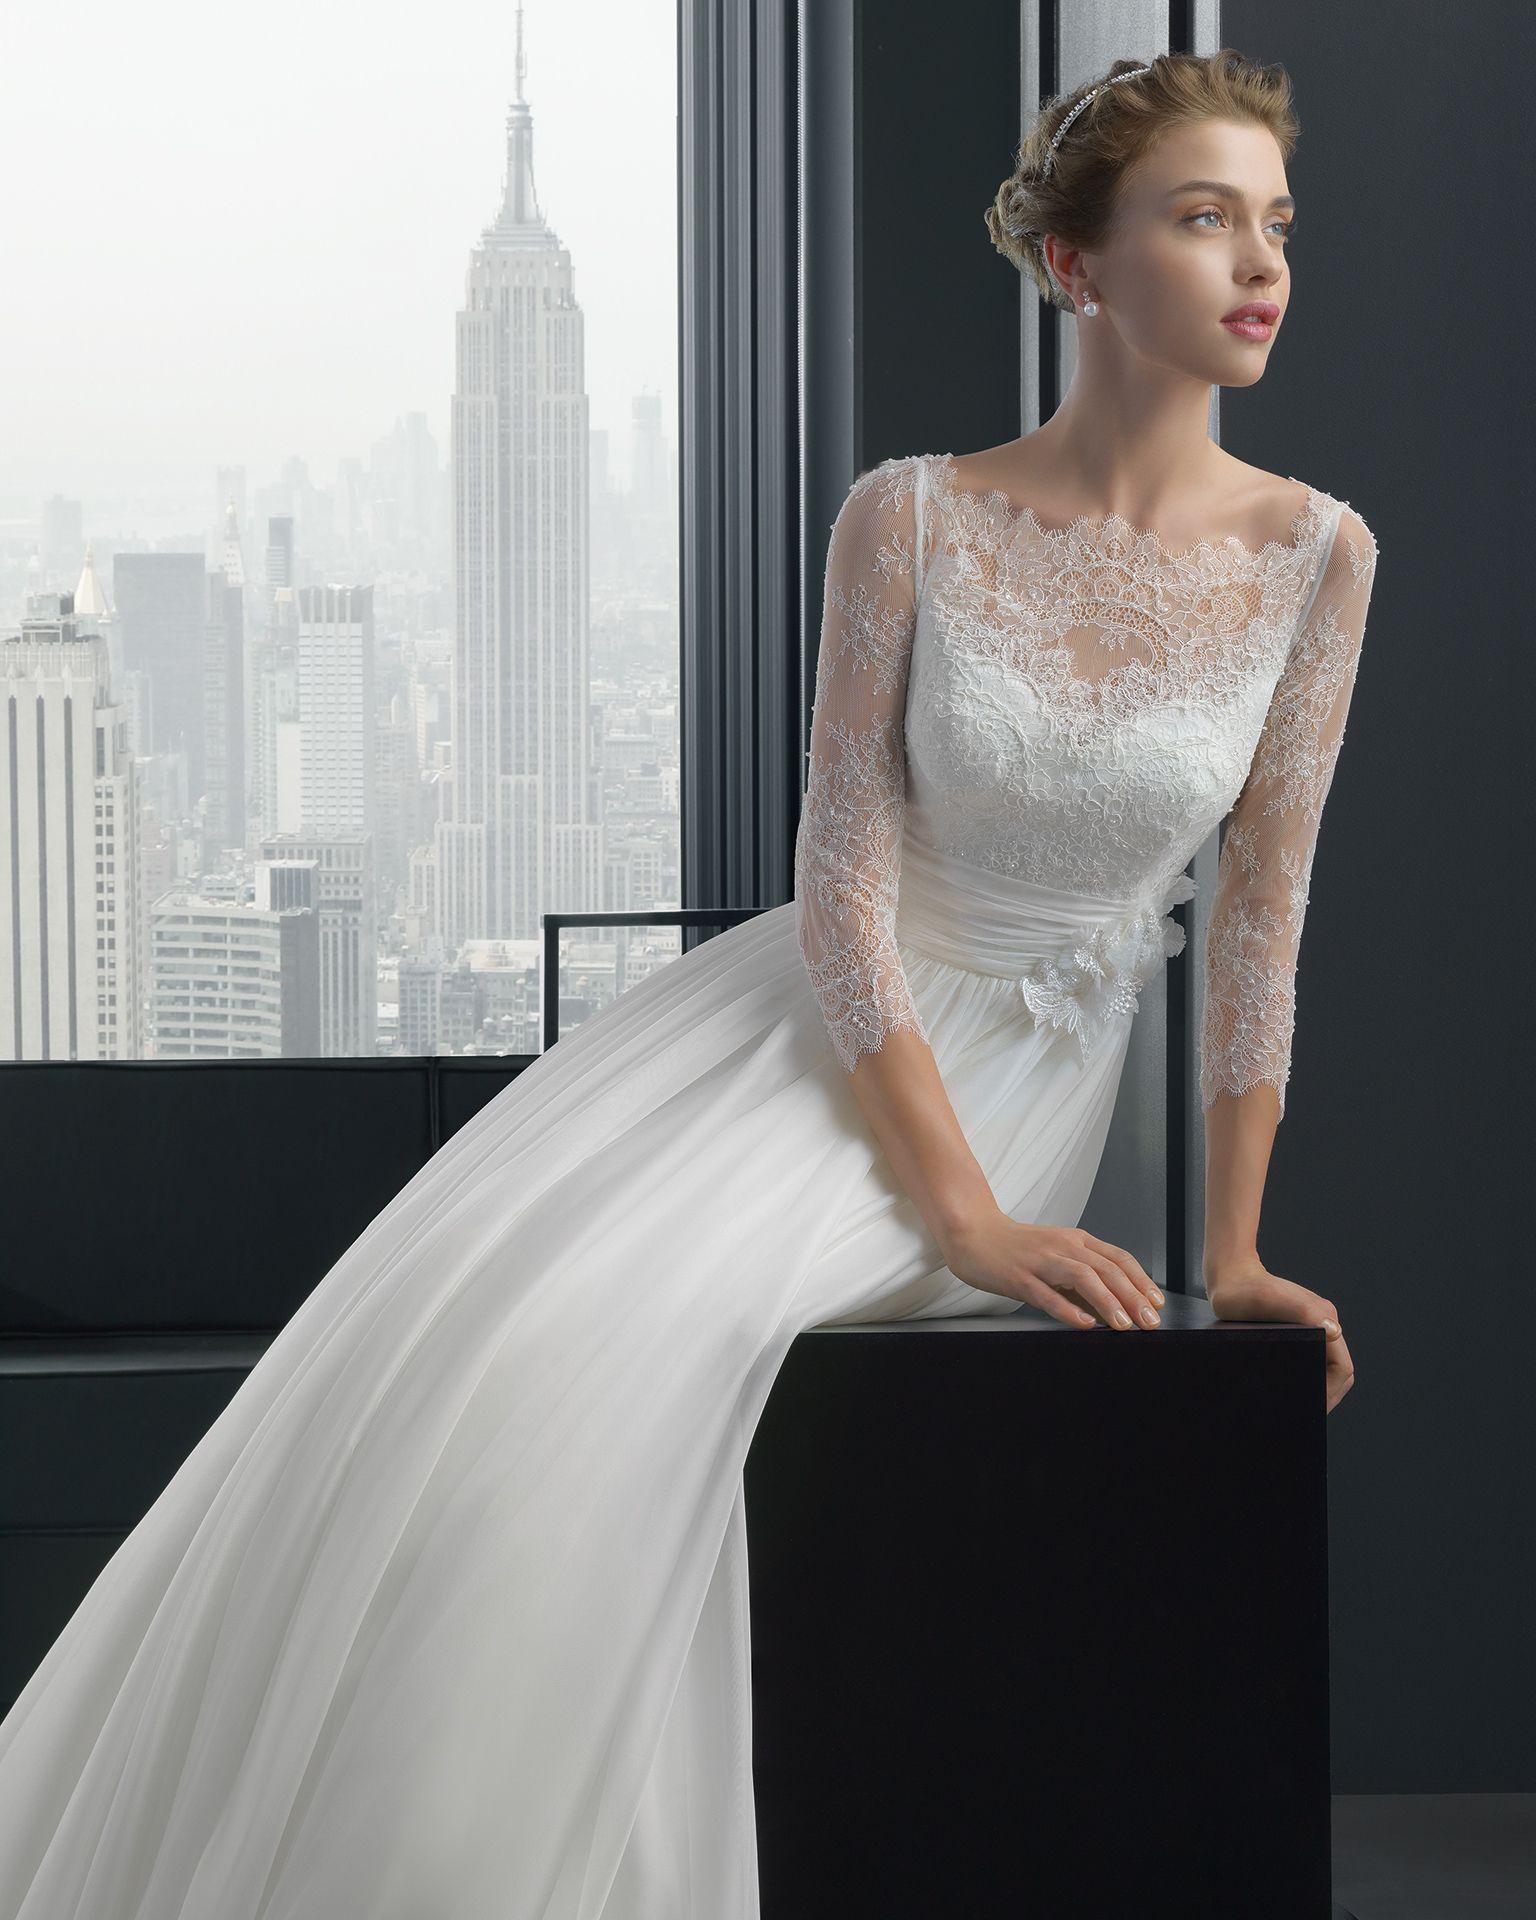 Relic vestido de novia two Rosa Clara